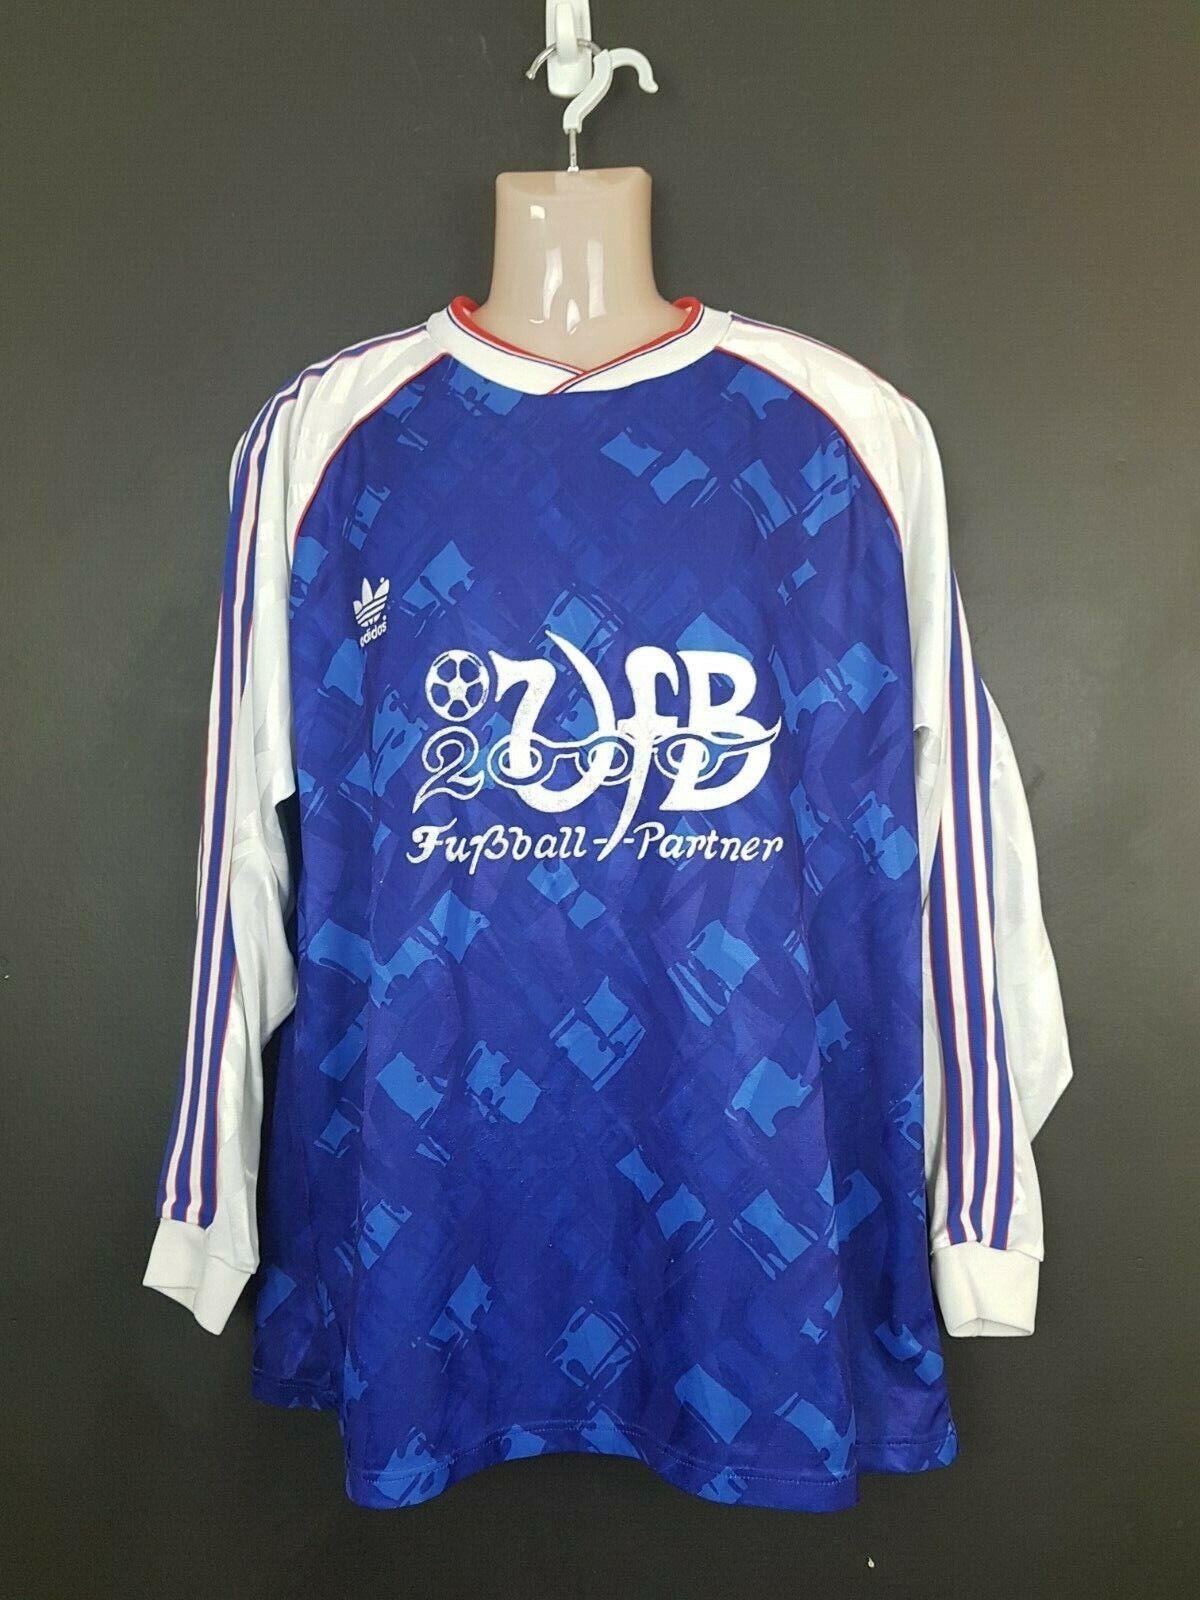 Vintage Adidas football soccer shirt jersey Arsenal-esq VFB Stuttgart XL 1990 92